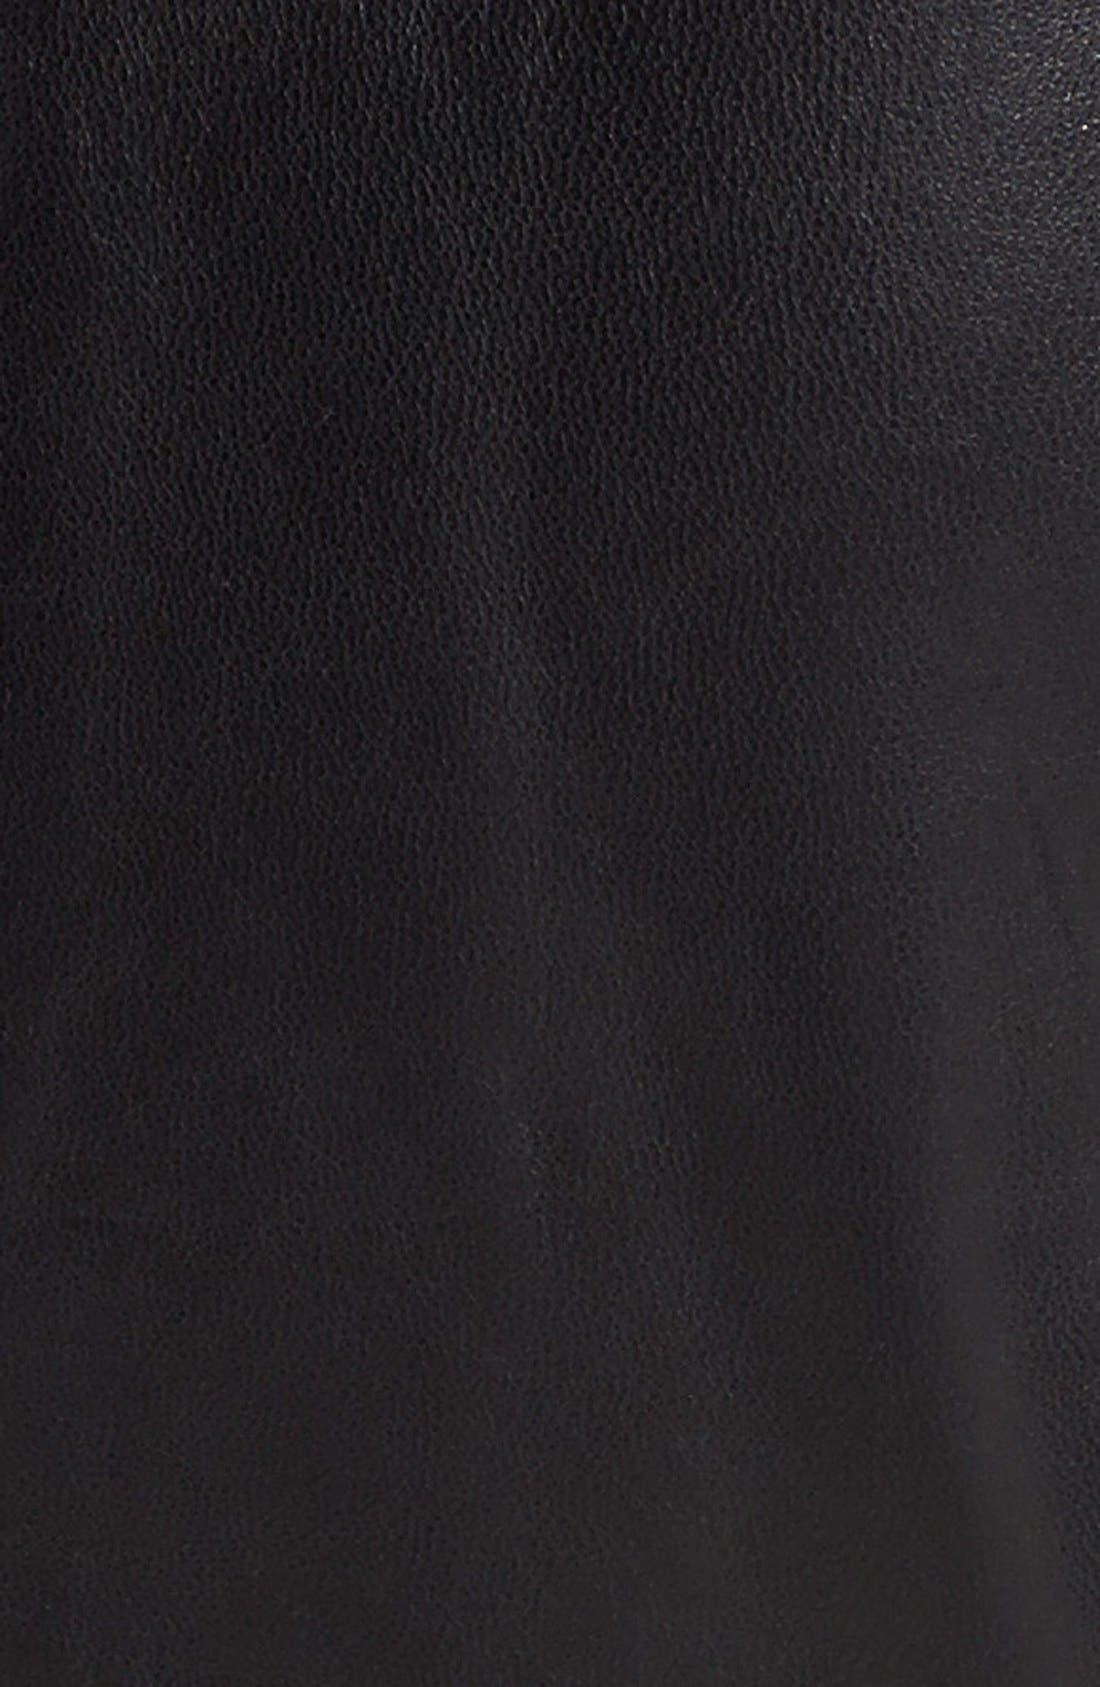 NICOLE MILLER,                             Trapunto Stitch Lambskin Leather Moto Jacket,                             Alternate thumbnail 3, color,                             001